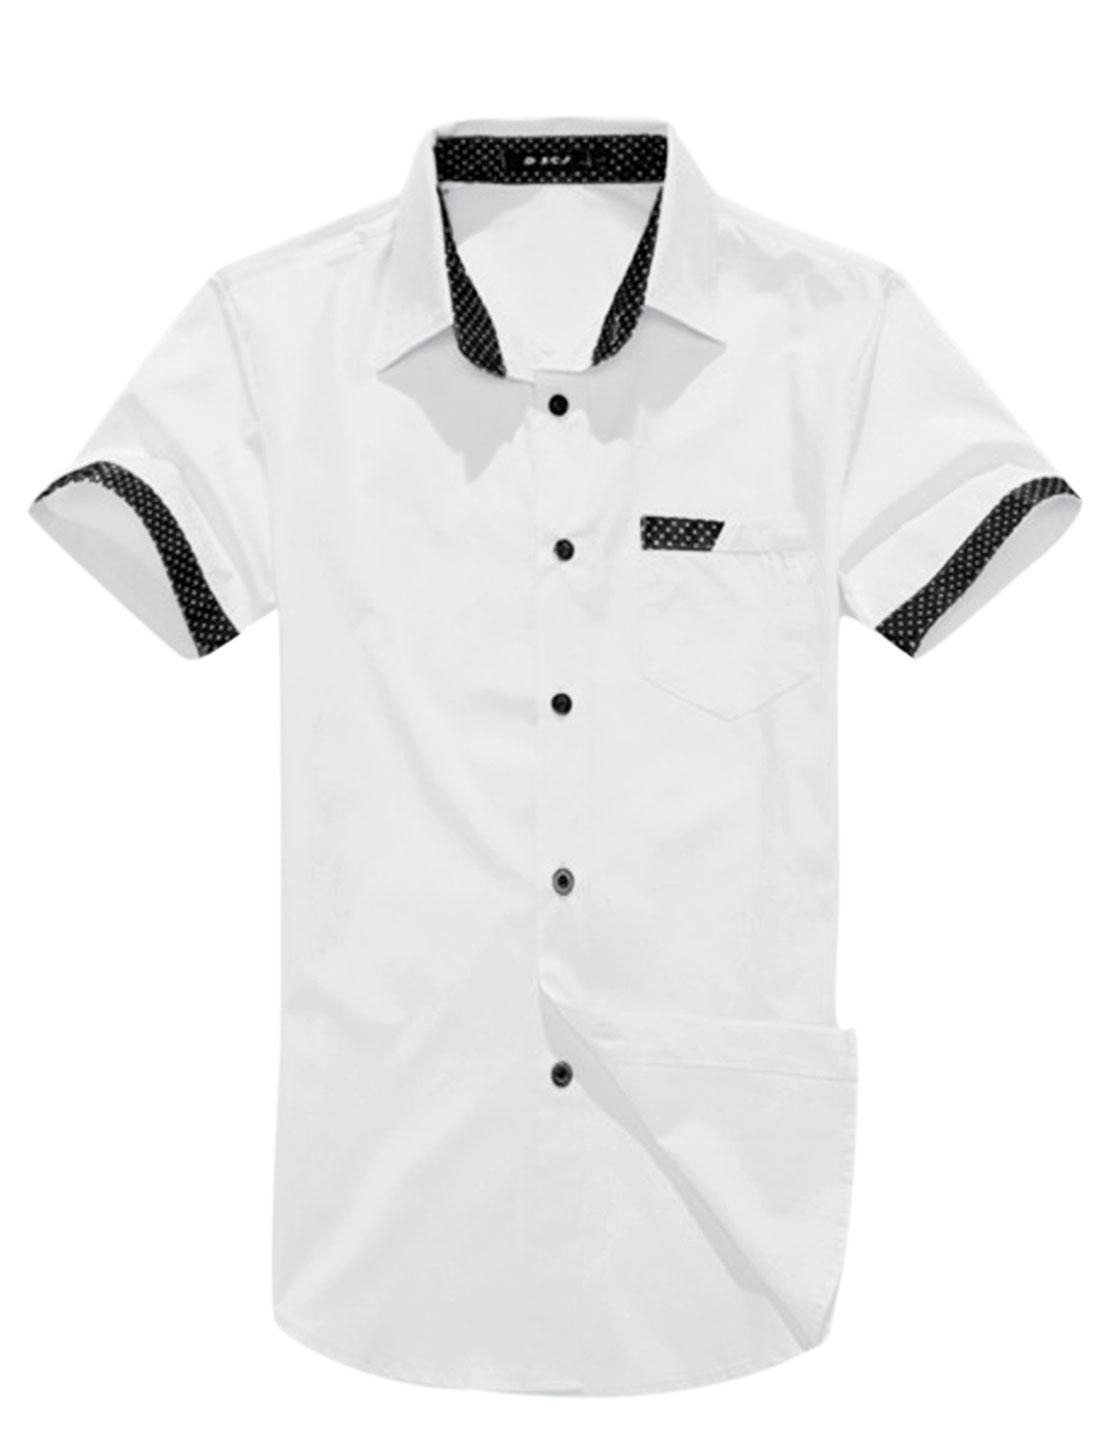 Man Dots Prints Detail Button Down Short Sleeves Casual Shirt White M